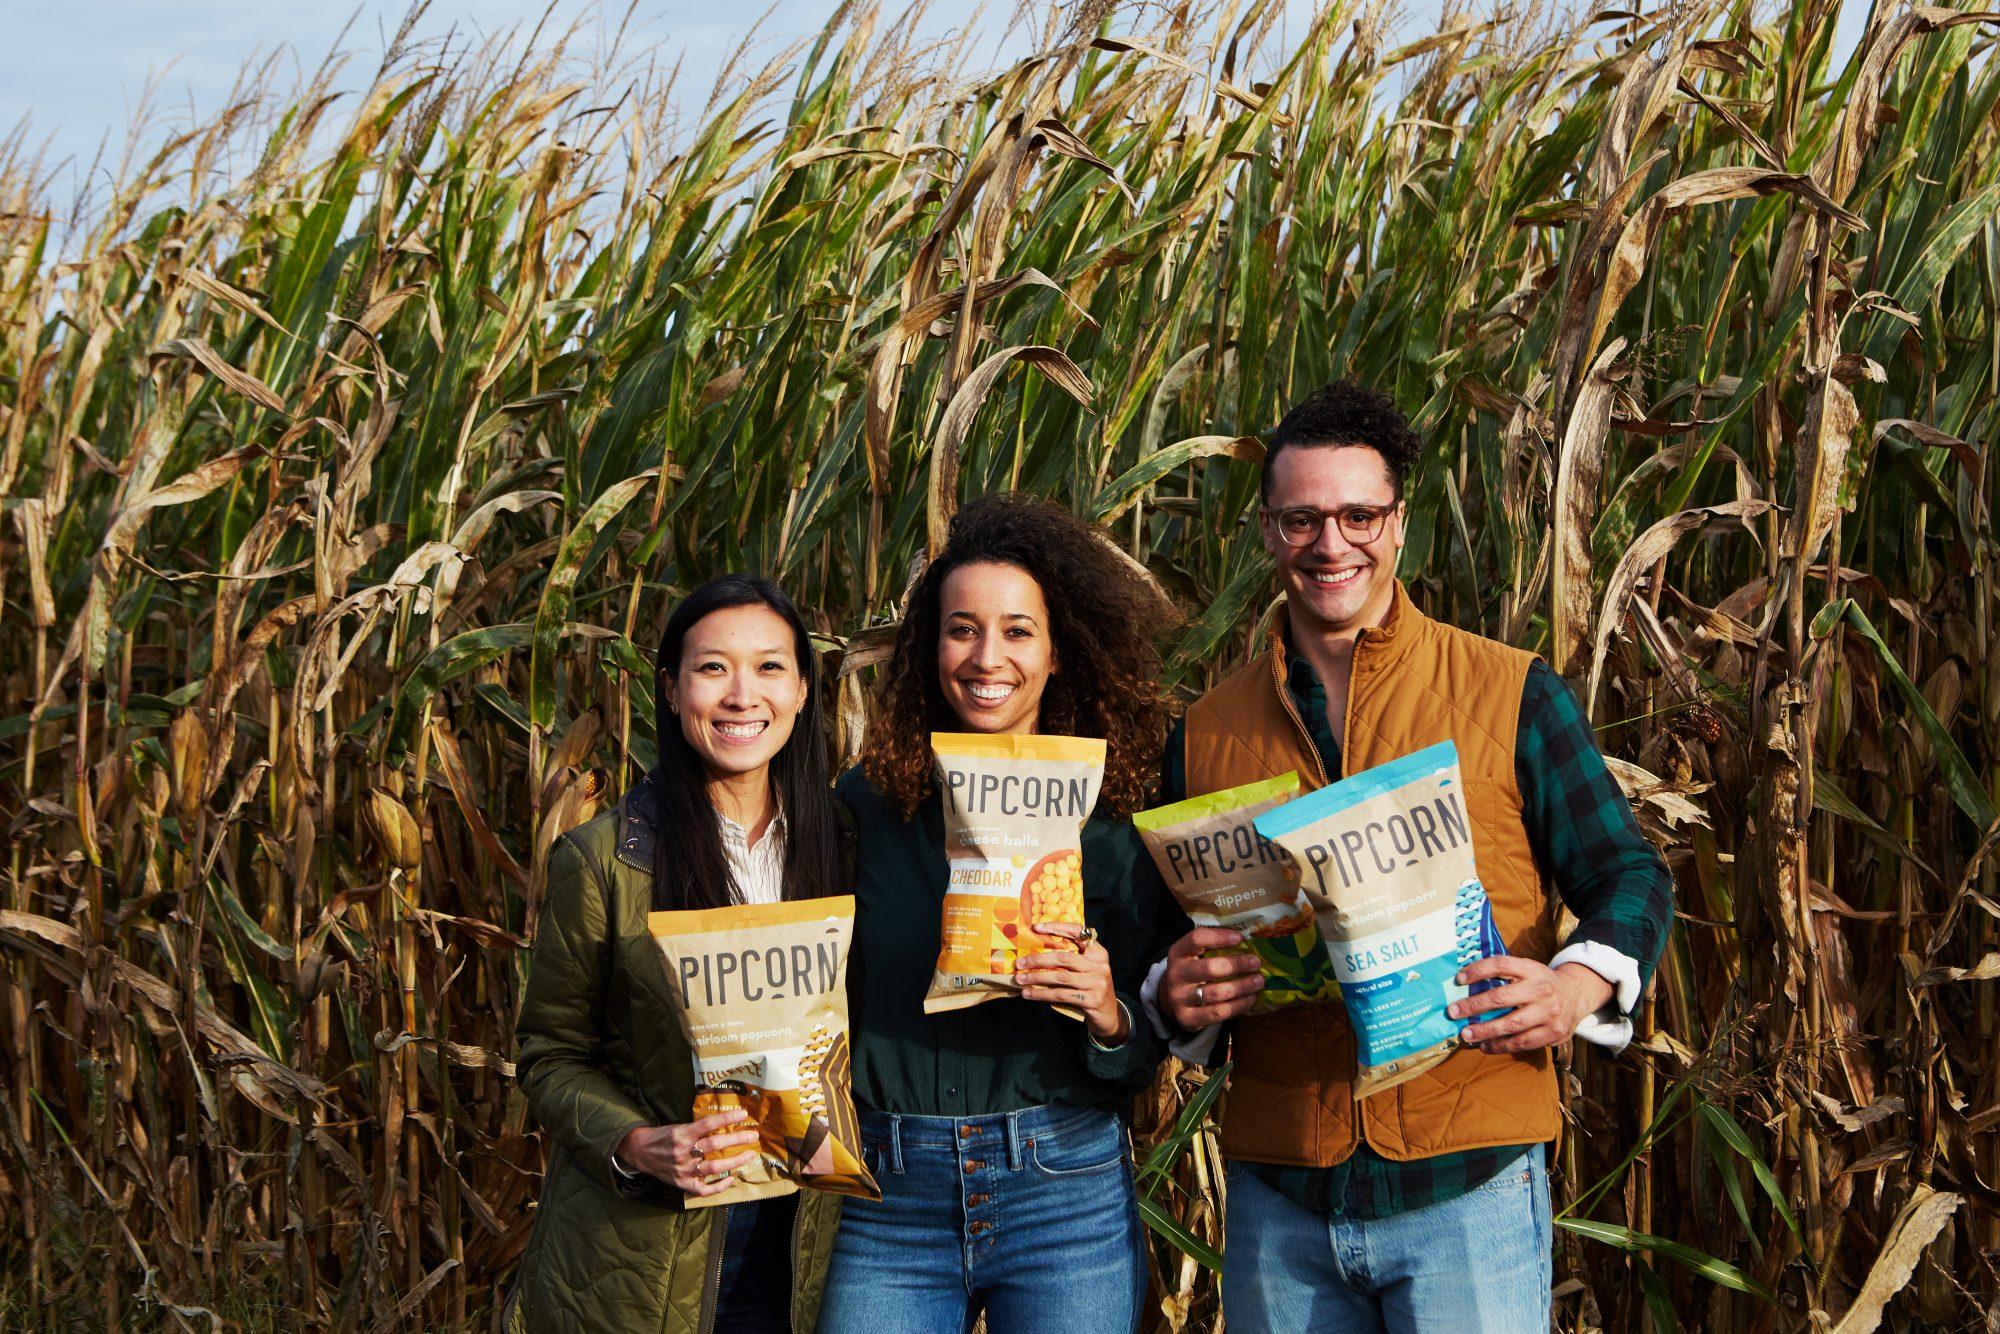 Pipcorn founders